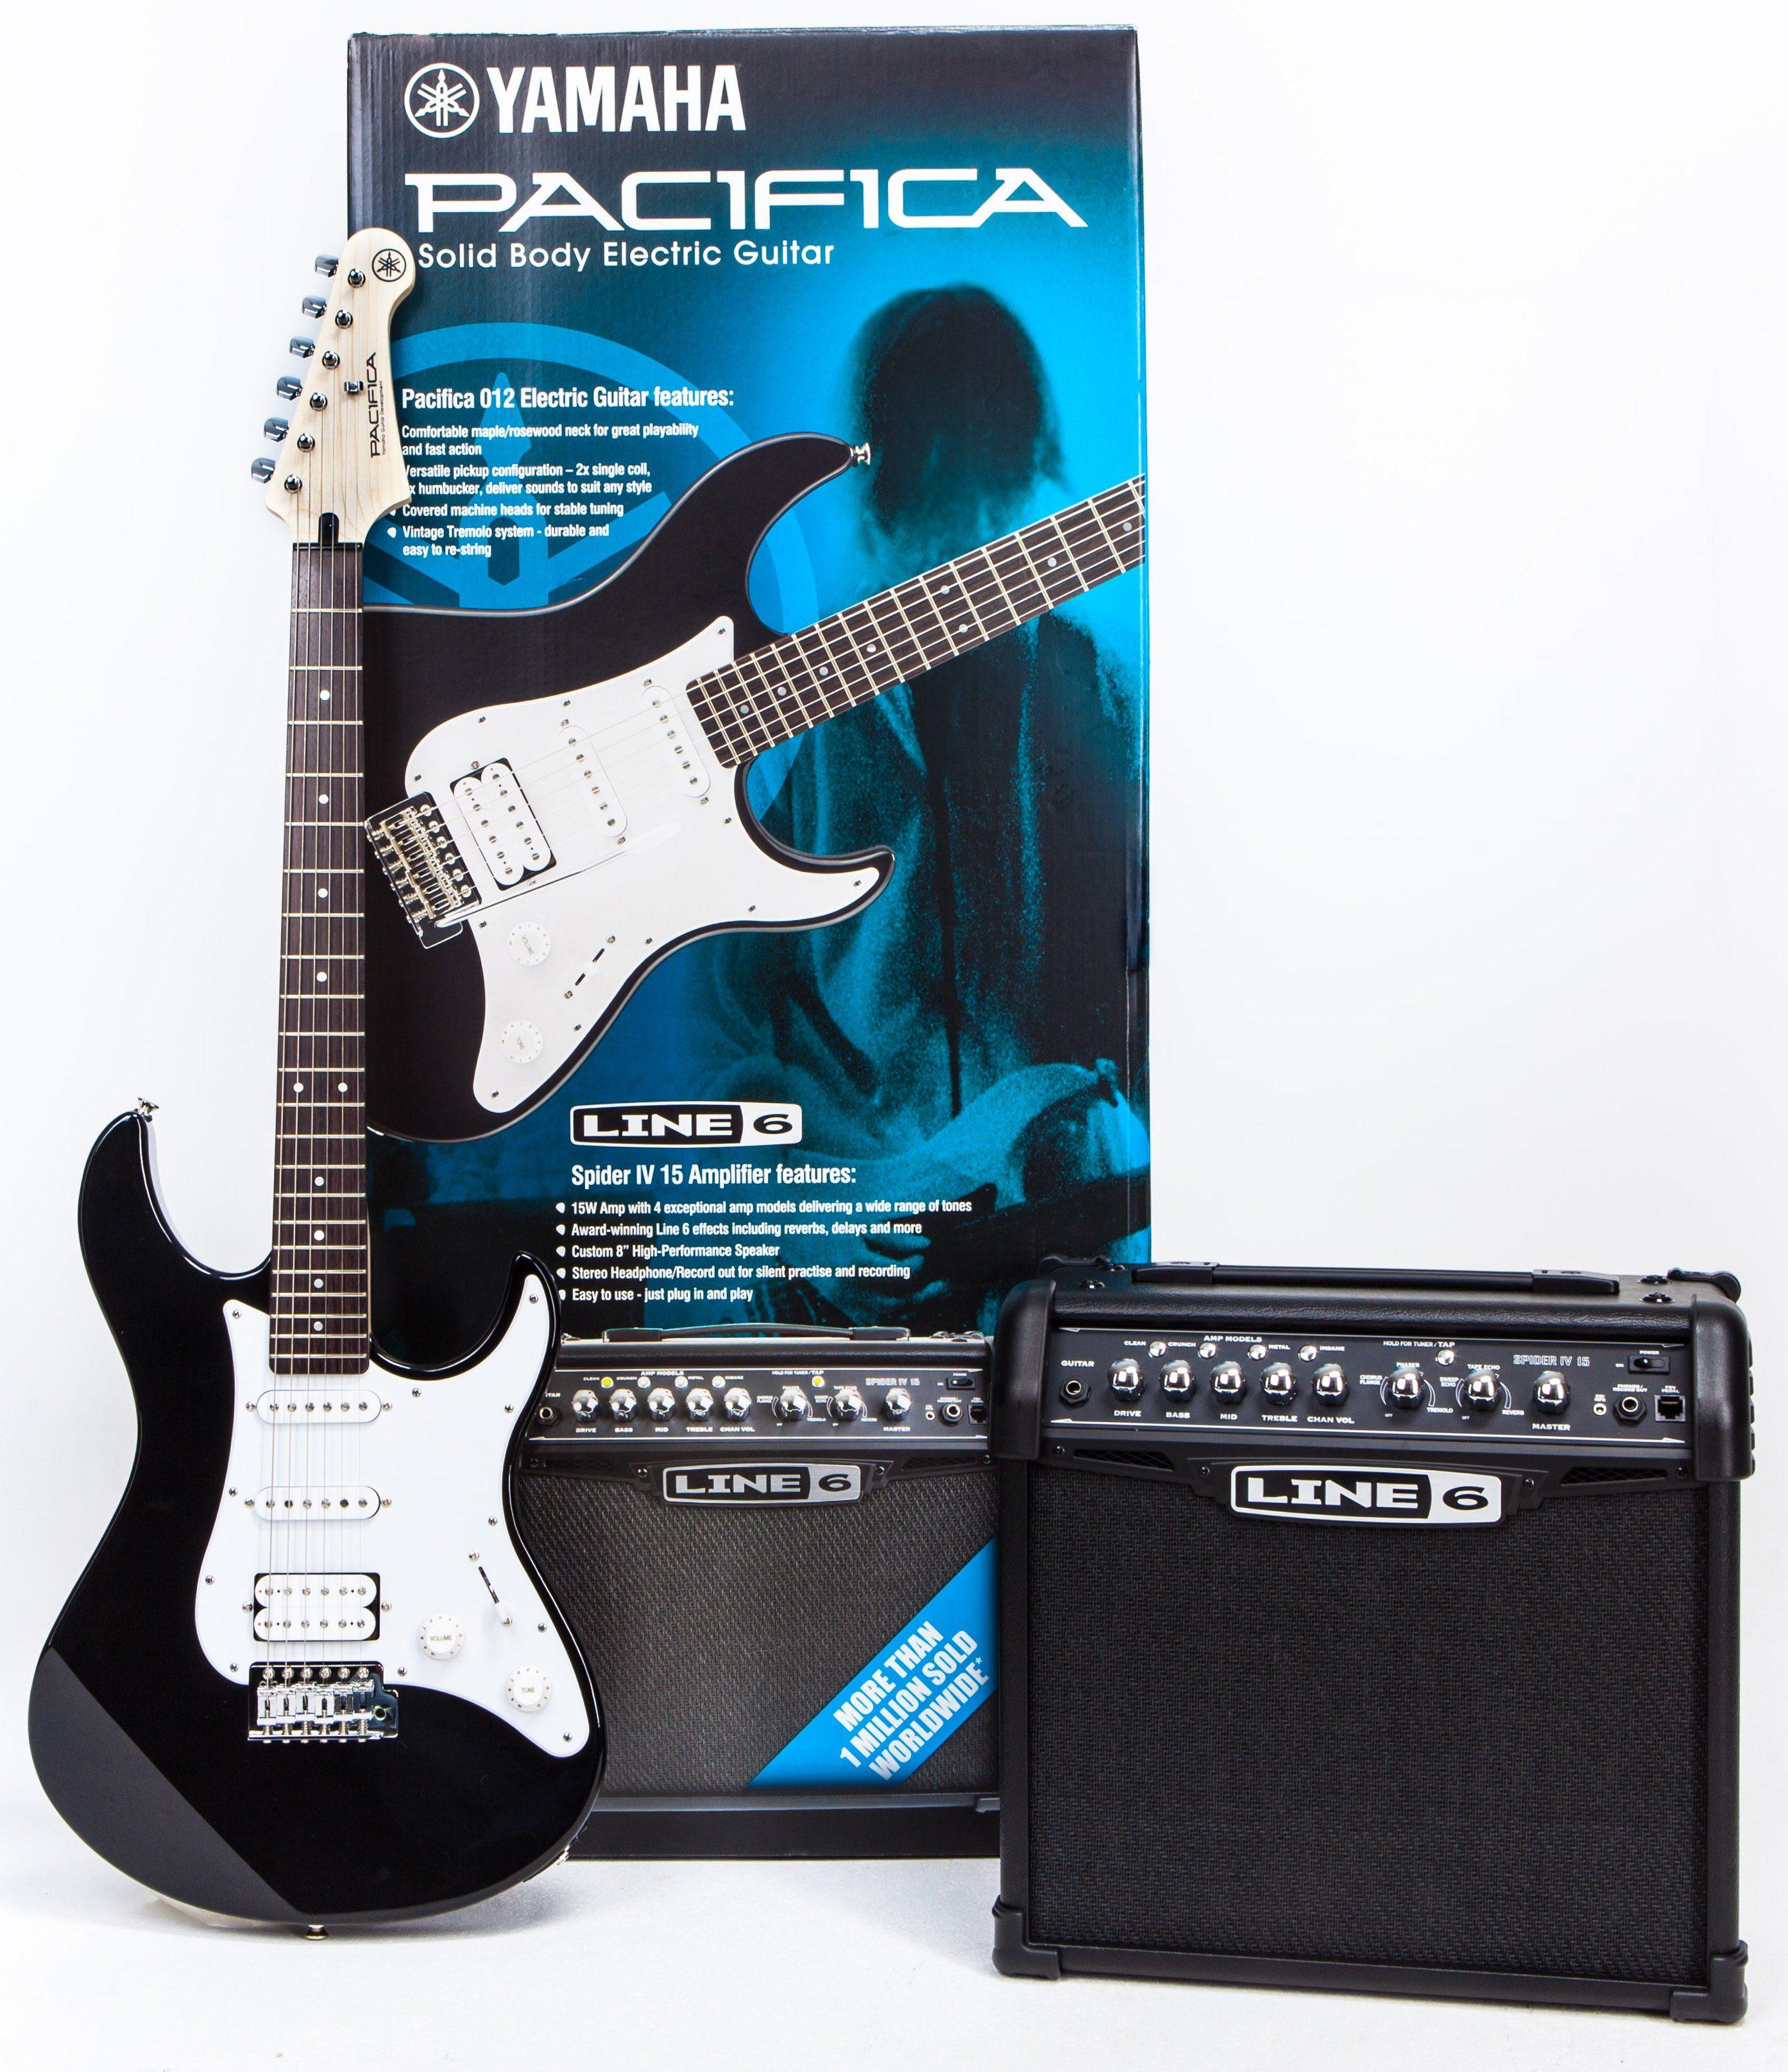 Yamaha Set E-Gitarre mit Verstärker, »PACIFICA 012 & Line 6 Spider 15 Paket«